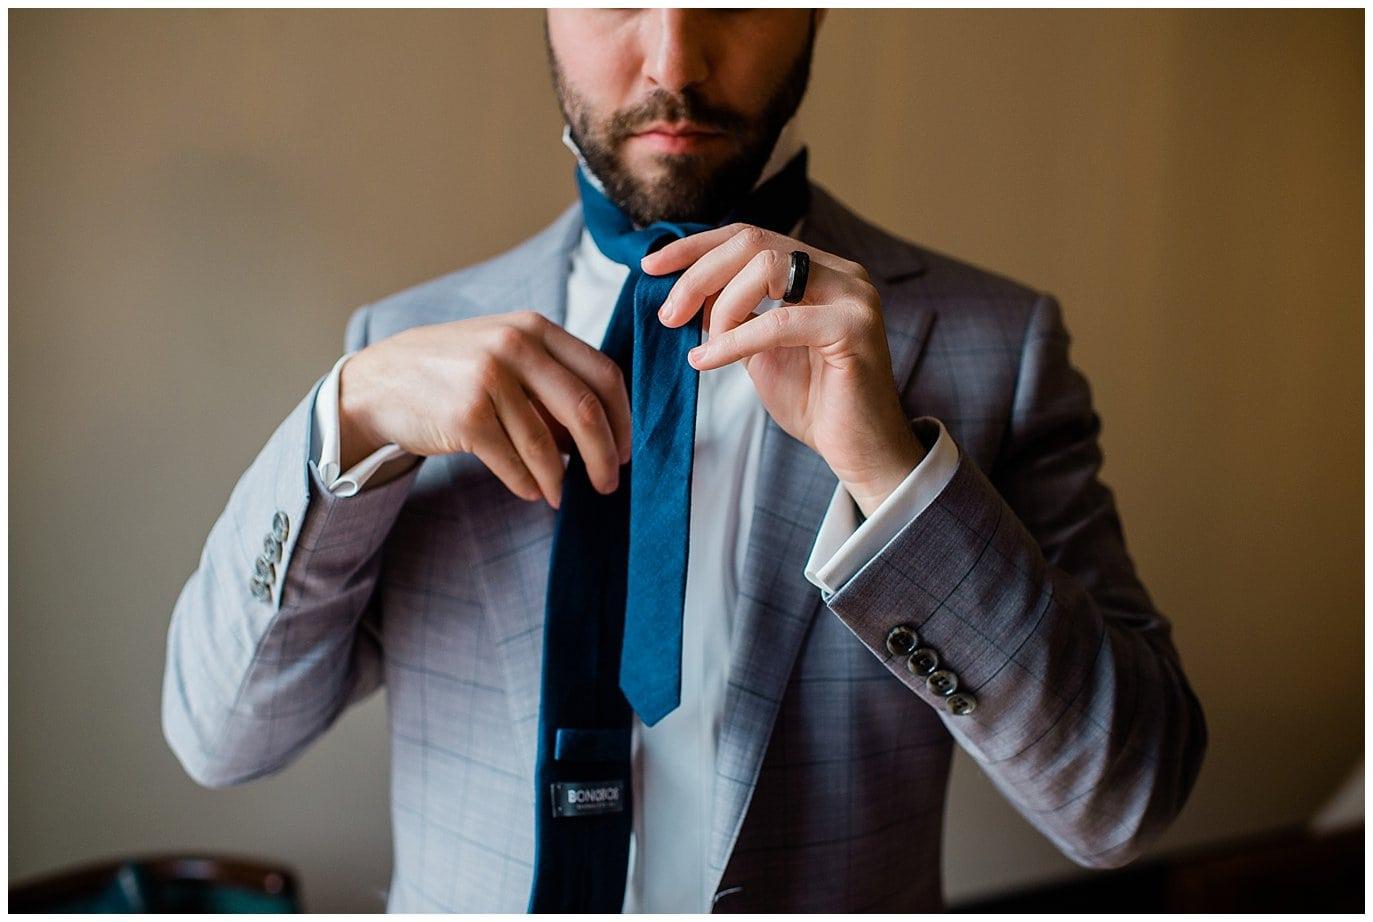 groom tying tie by Blanc Wedding Photographer Jennie Crate